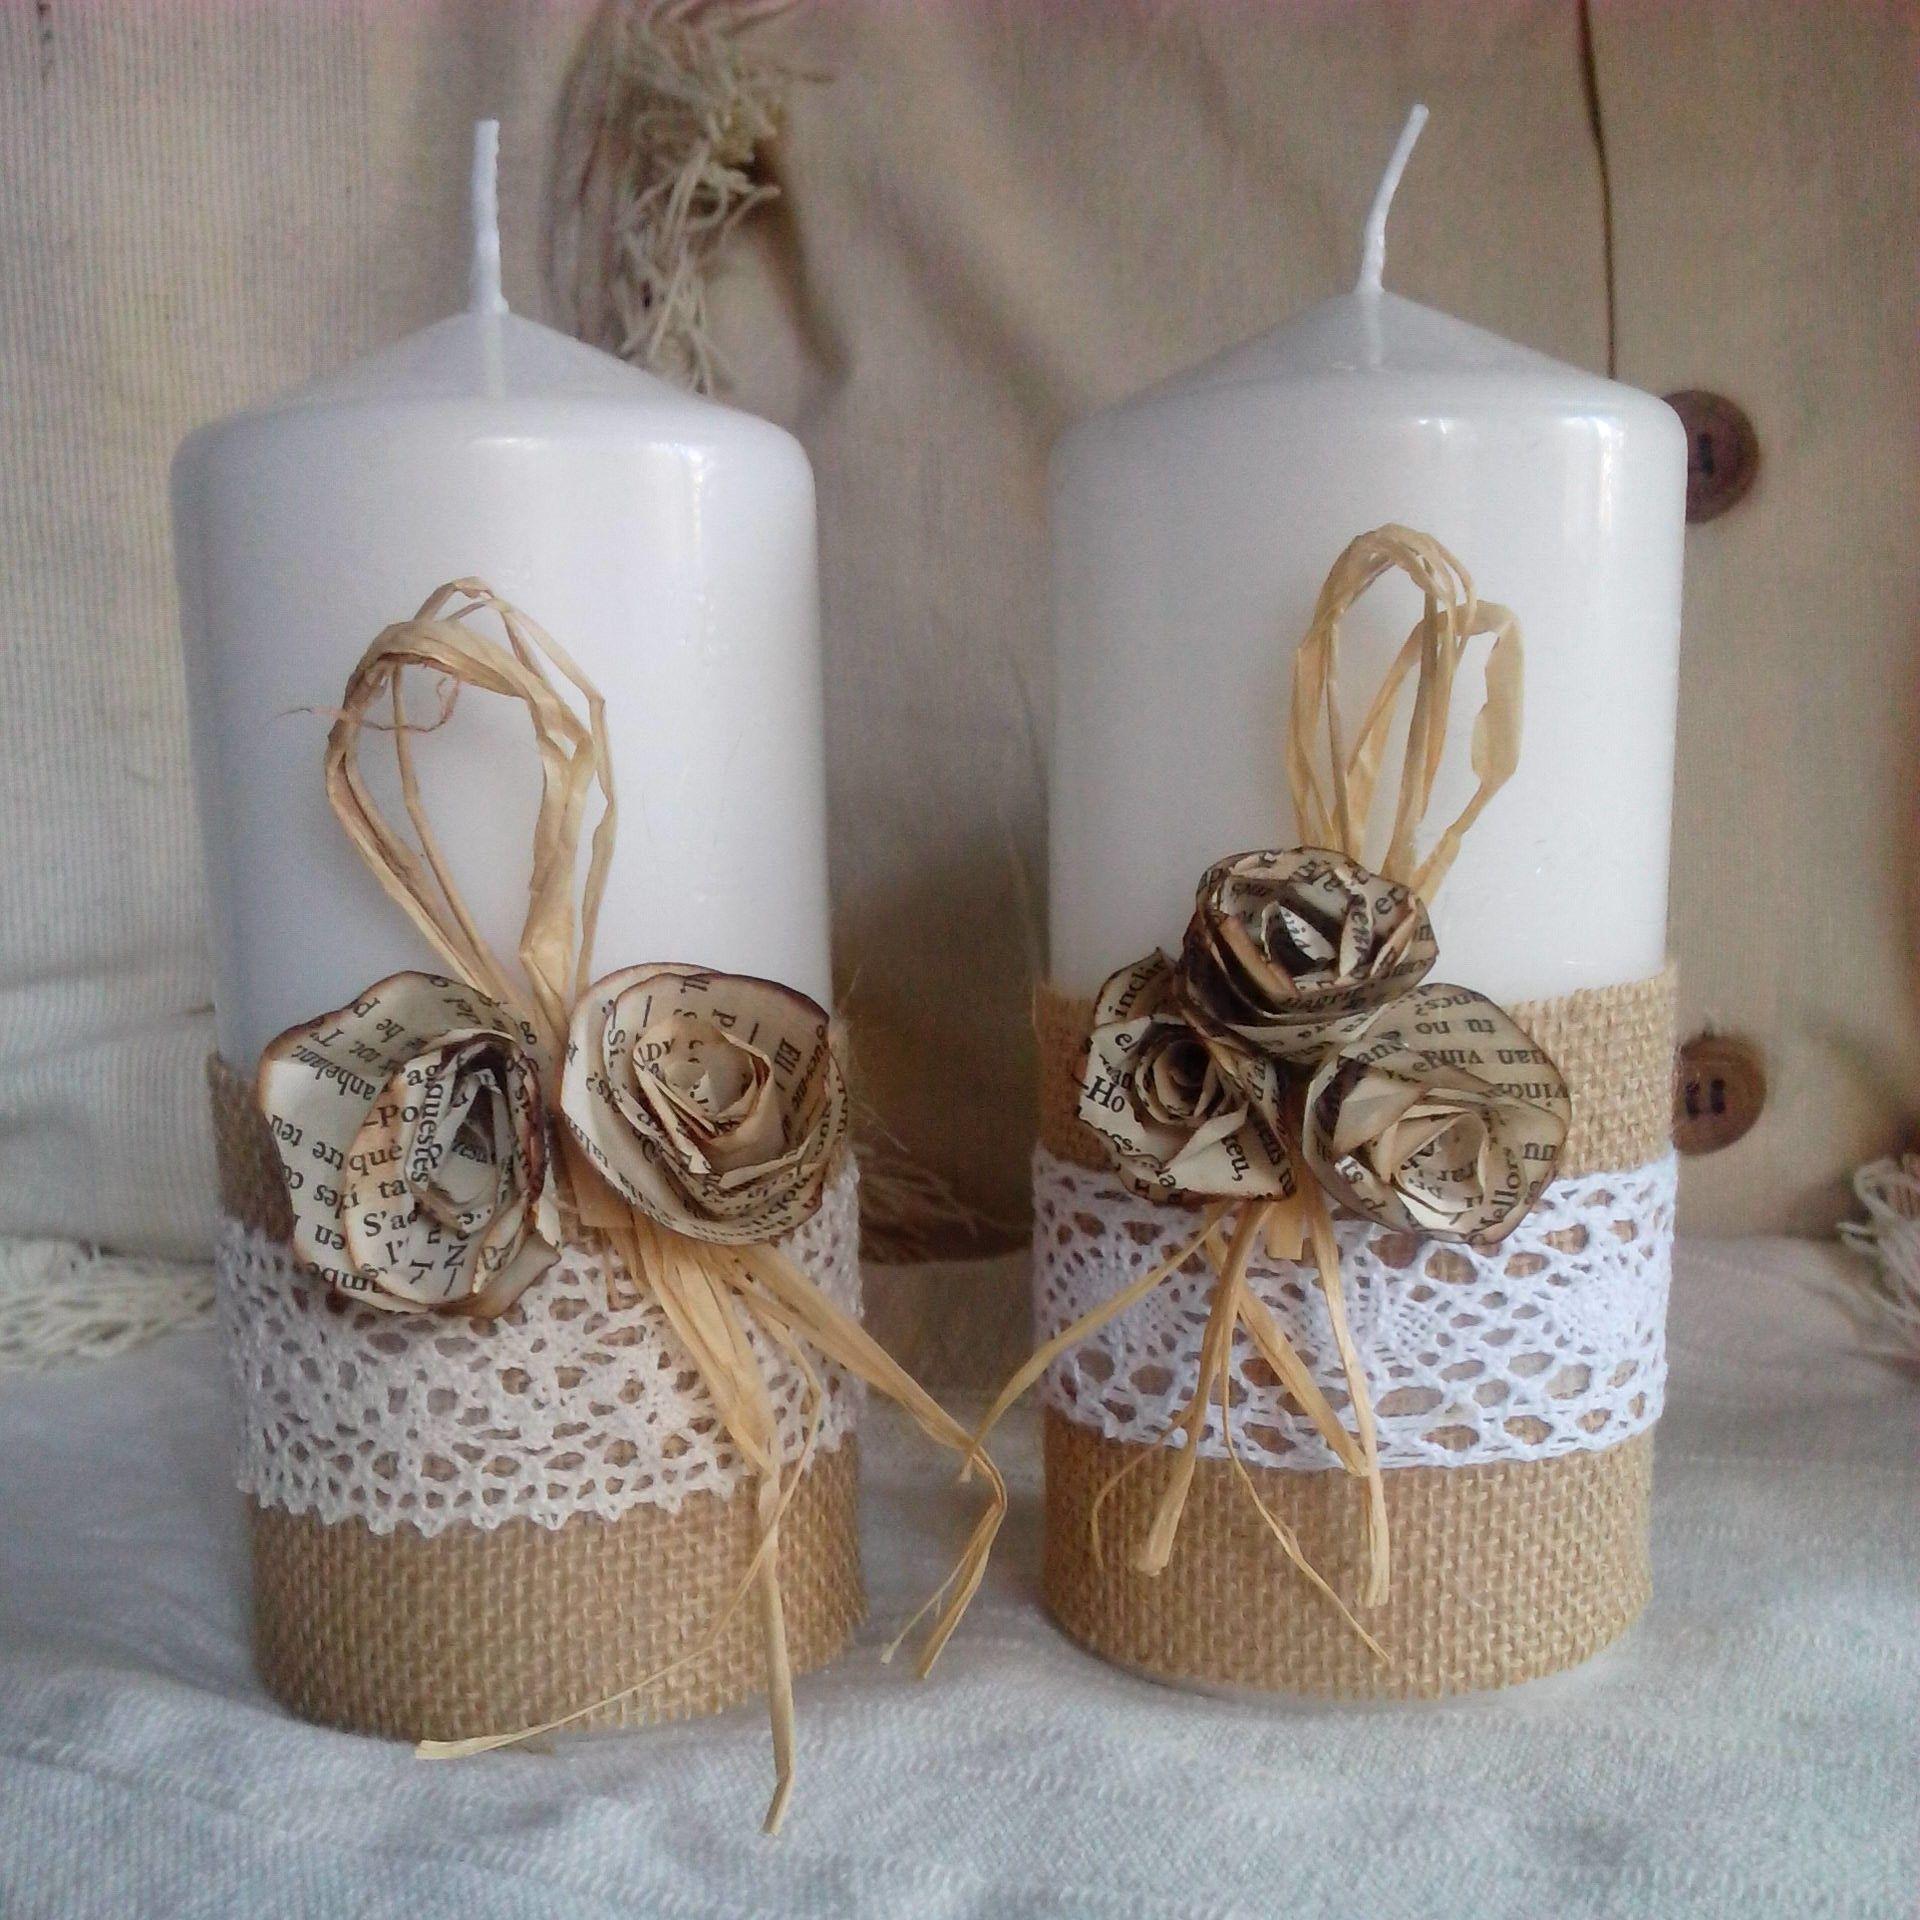 Velas juta renda e flores de papel artesanato geral pinterest flores de papel juta e - Velas decoradas para navidad ...